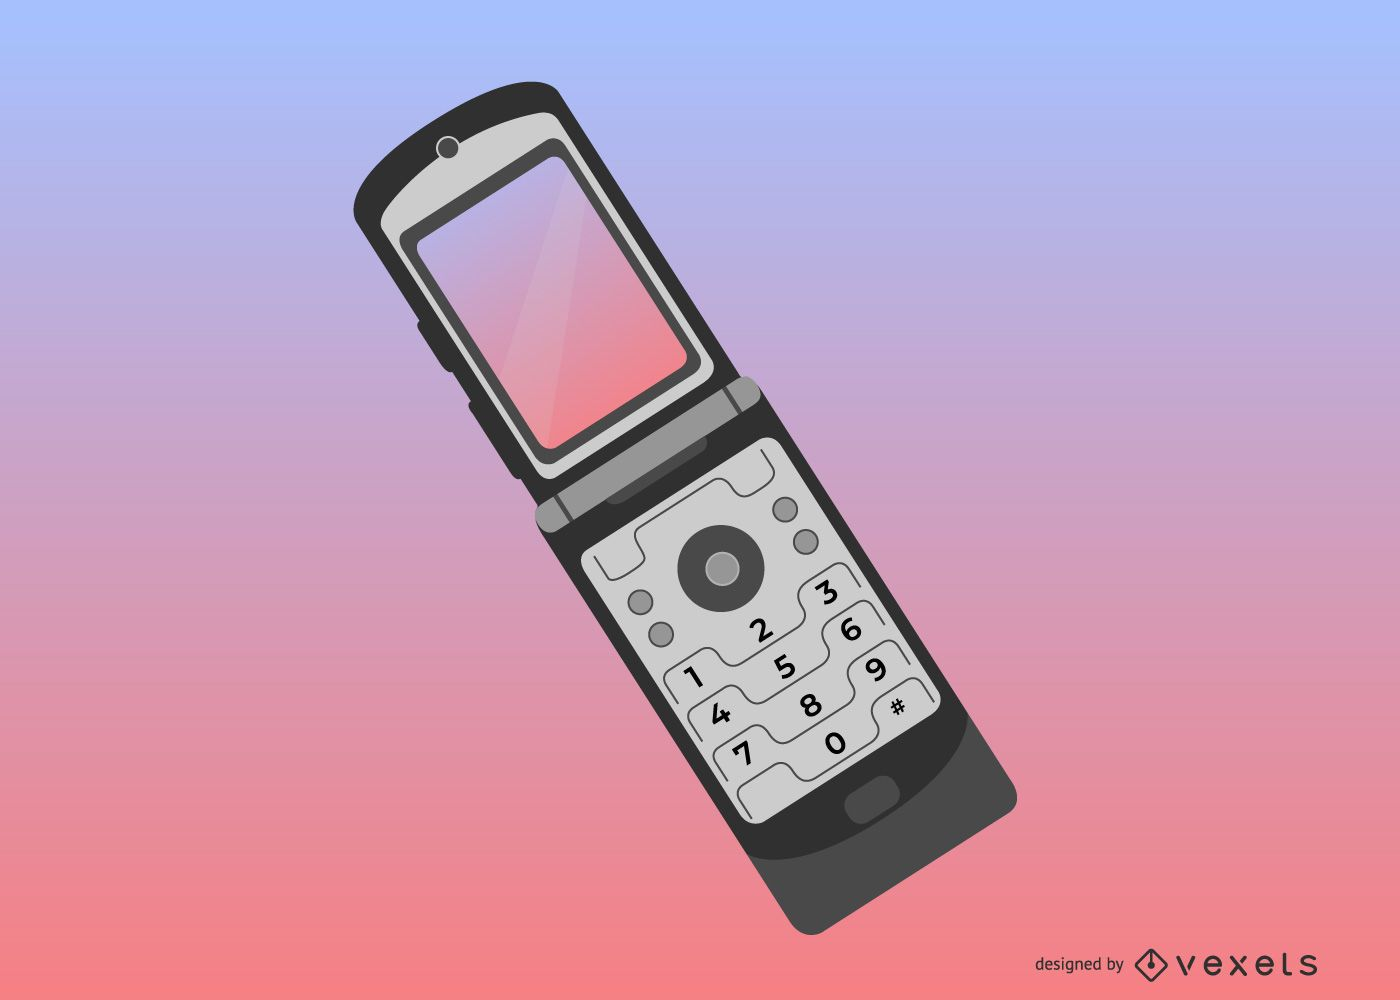 Opened Motorola V3